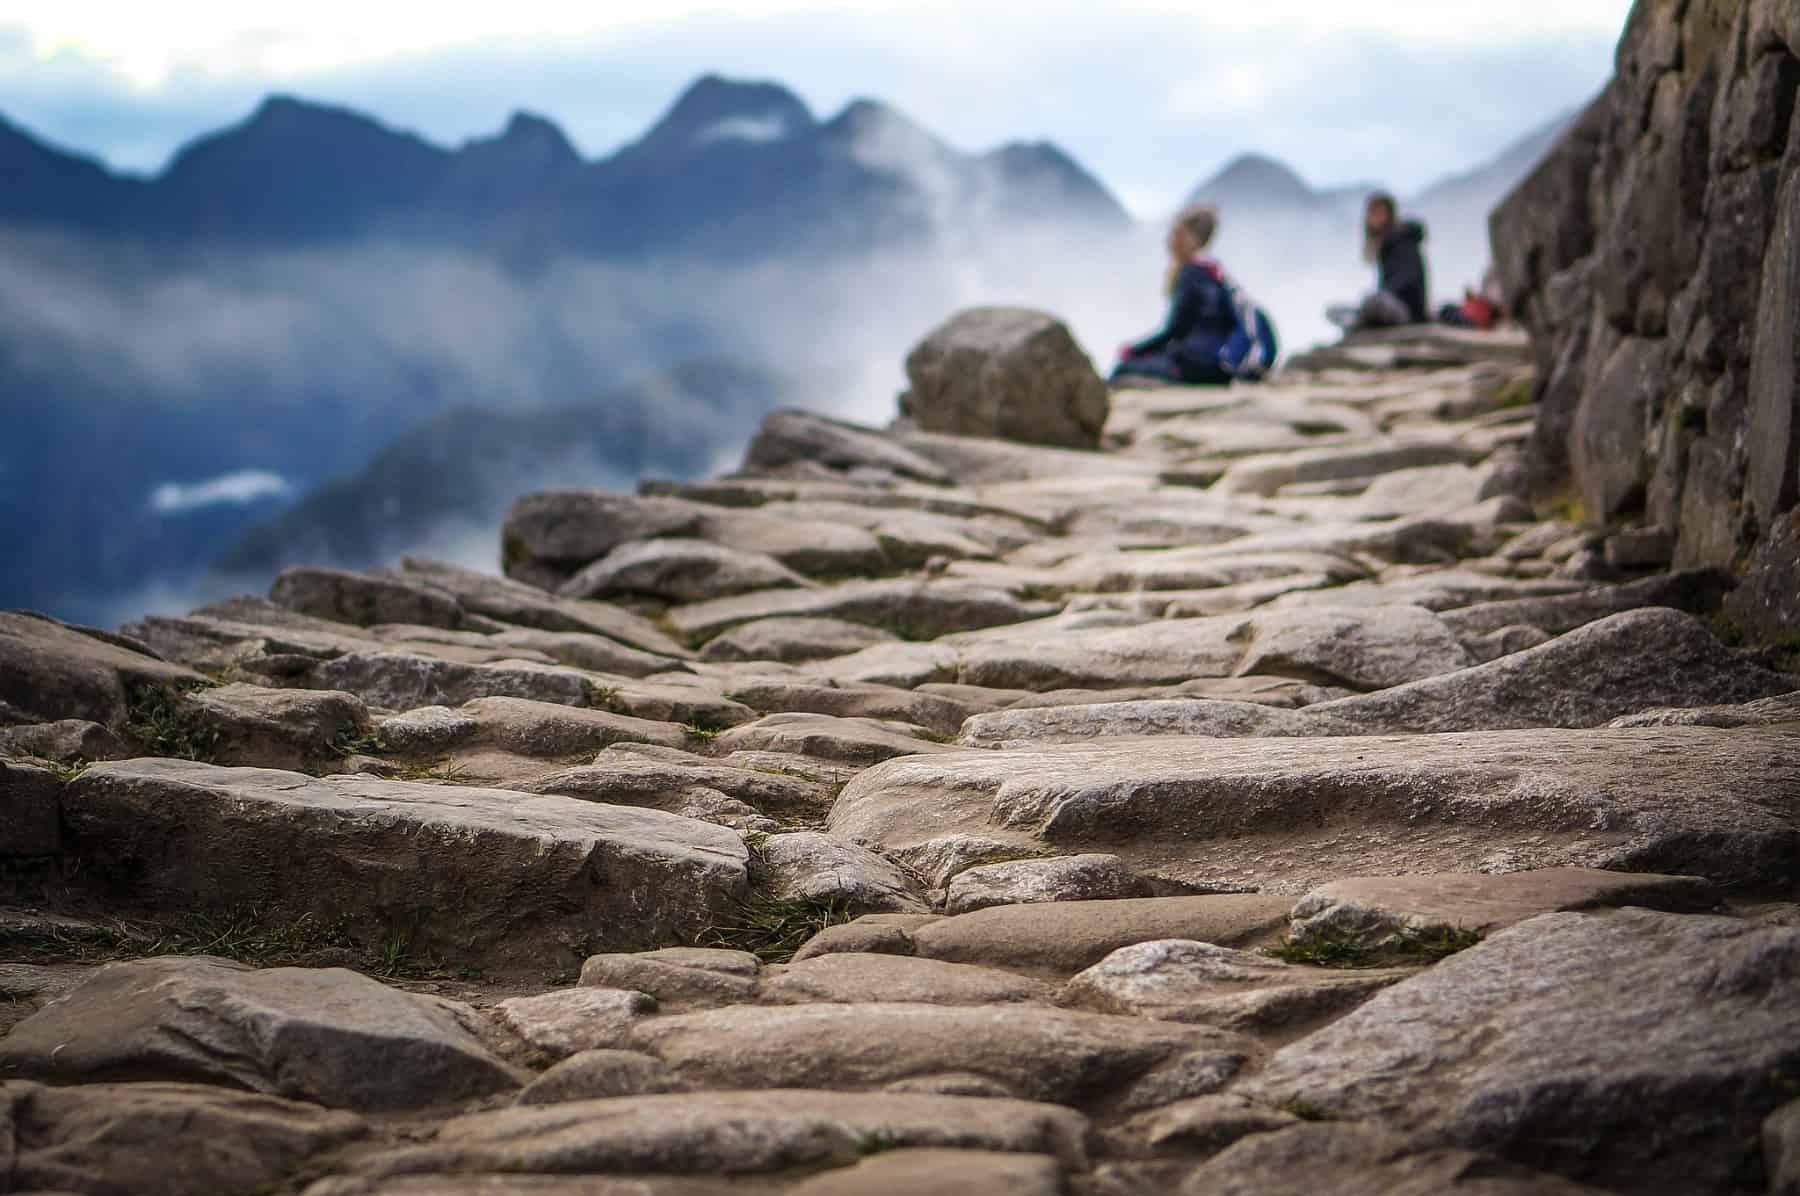 Machu Picchu lookout